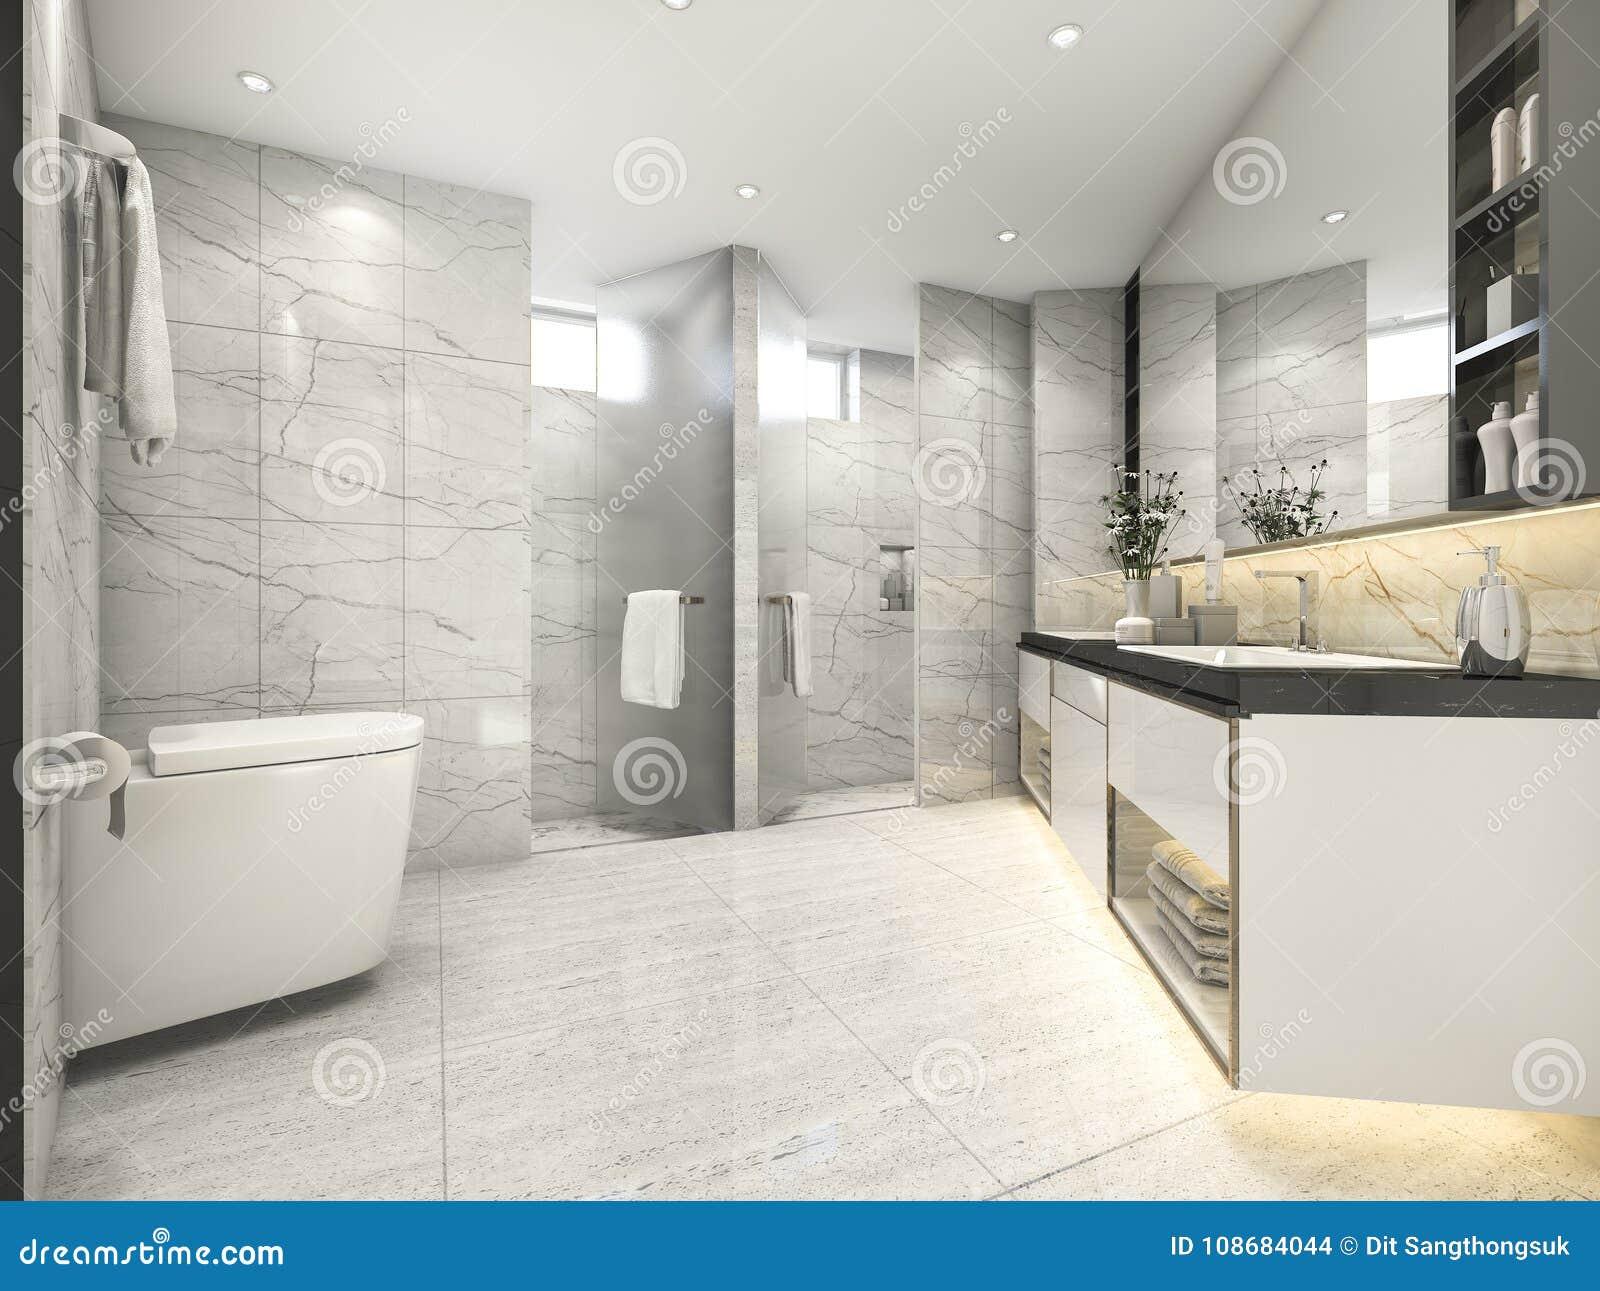 3d Rendering Cream Modern Vintage Bathroom With Luxury Tile Decor Stock Illustration Illustration Of Modern Bathtub 108684044